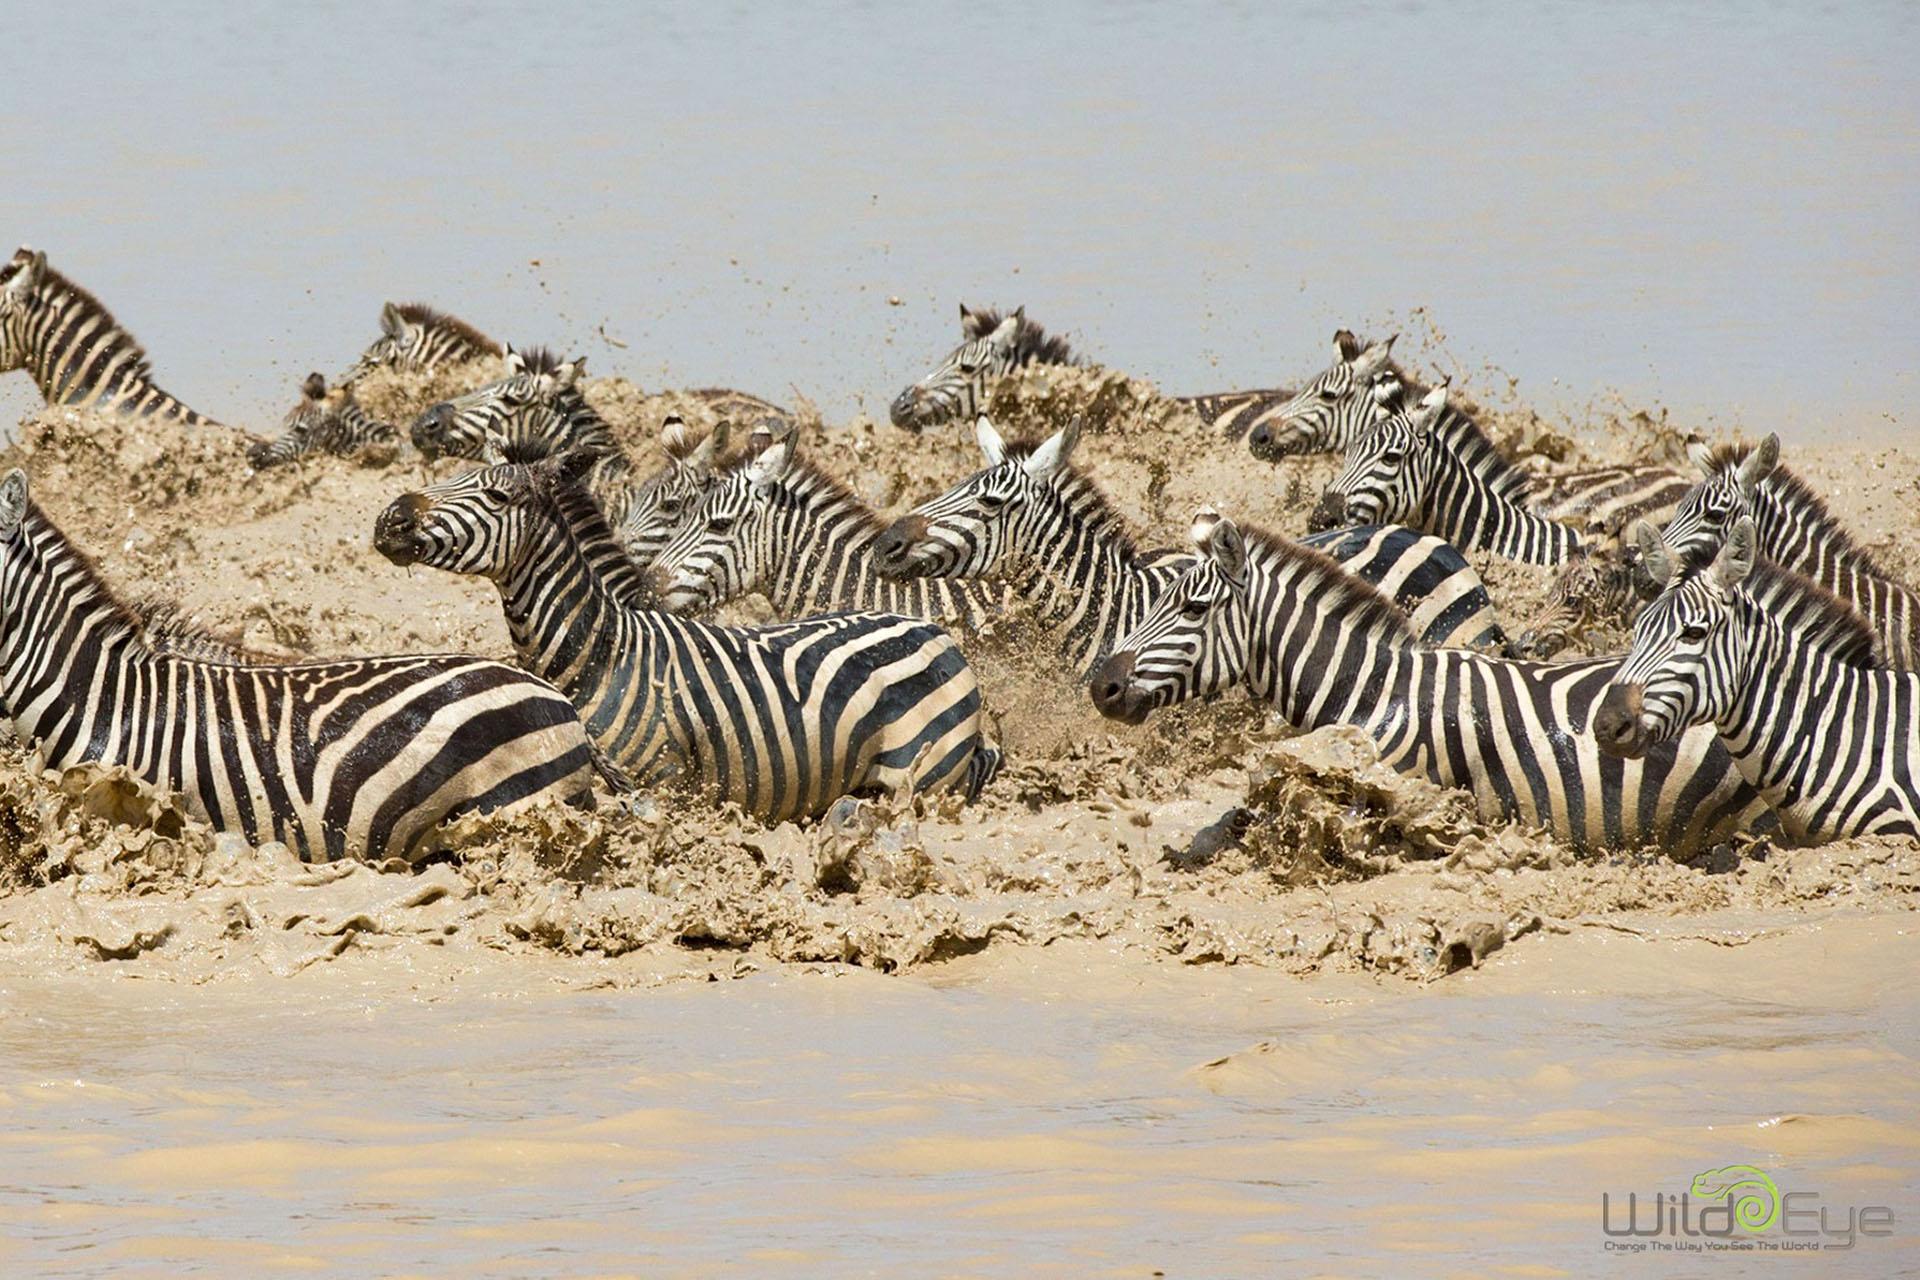 marlon-du-toit-photography-signature-photo-safaris-maasai-wanderings-africa-wildlife-zebra